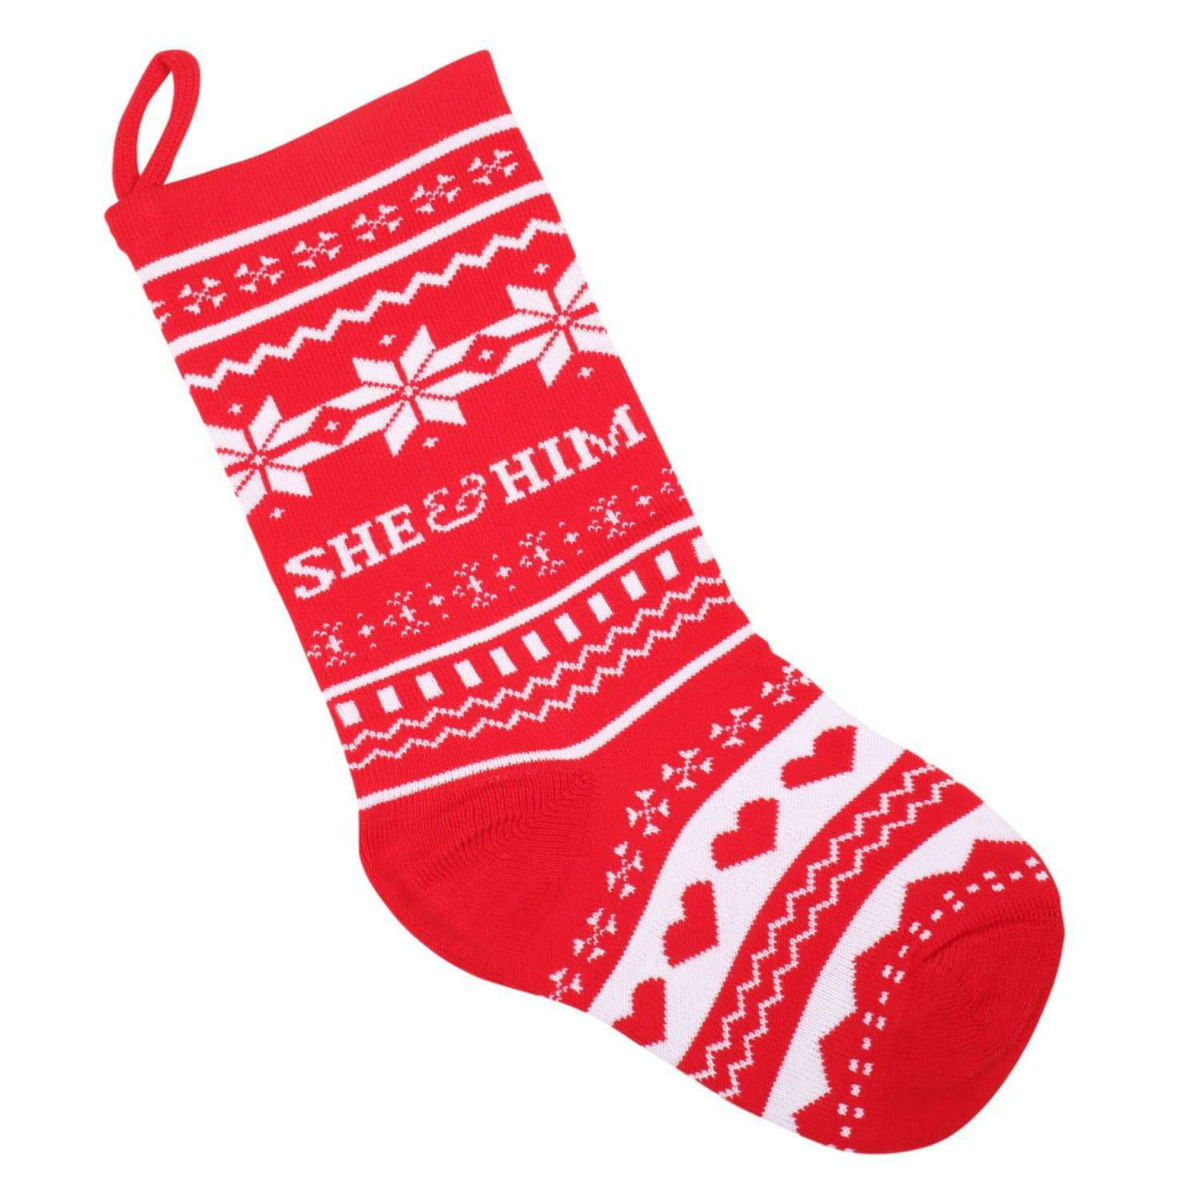 She & Him Knit Christmas Stocking